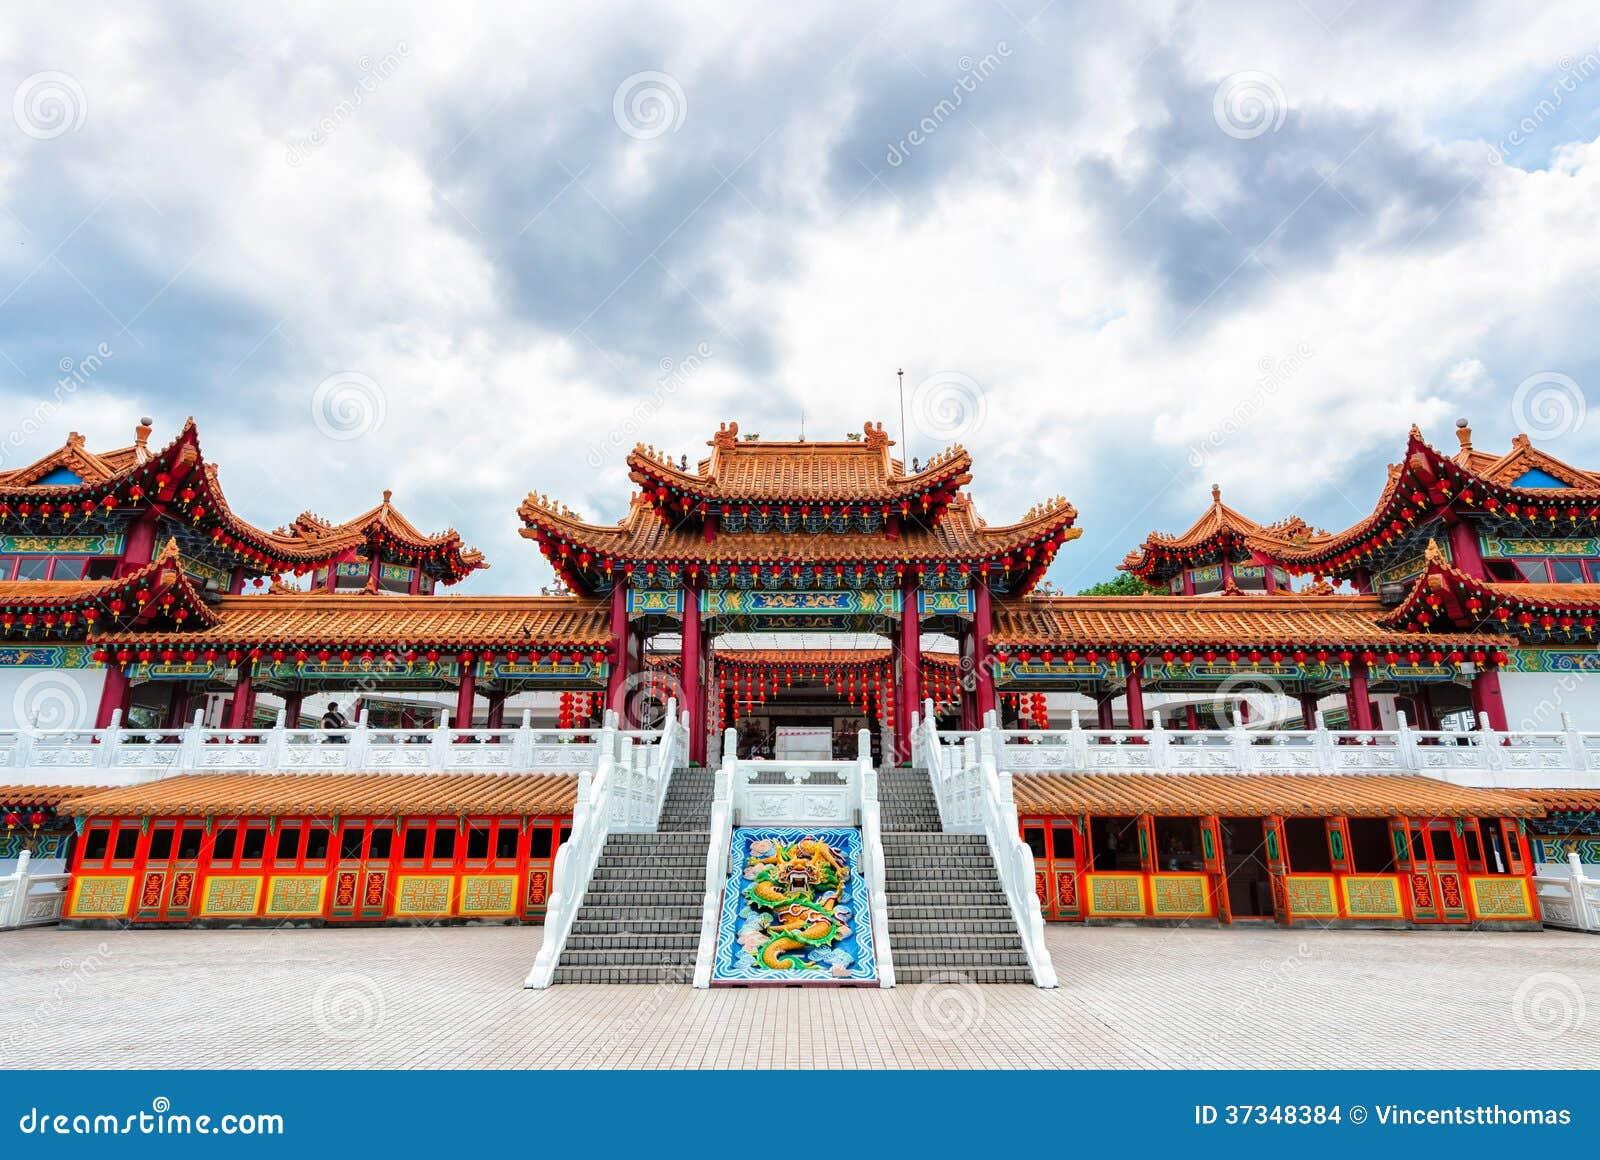 De Tempel van Theanhou